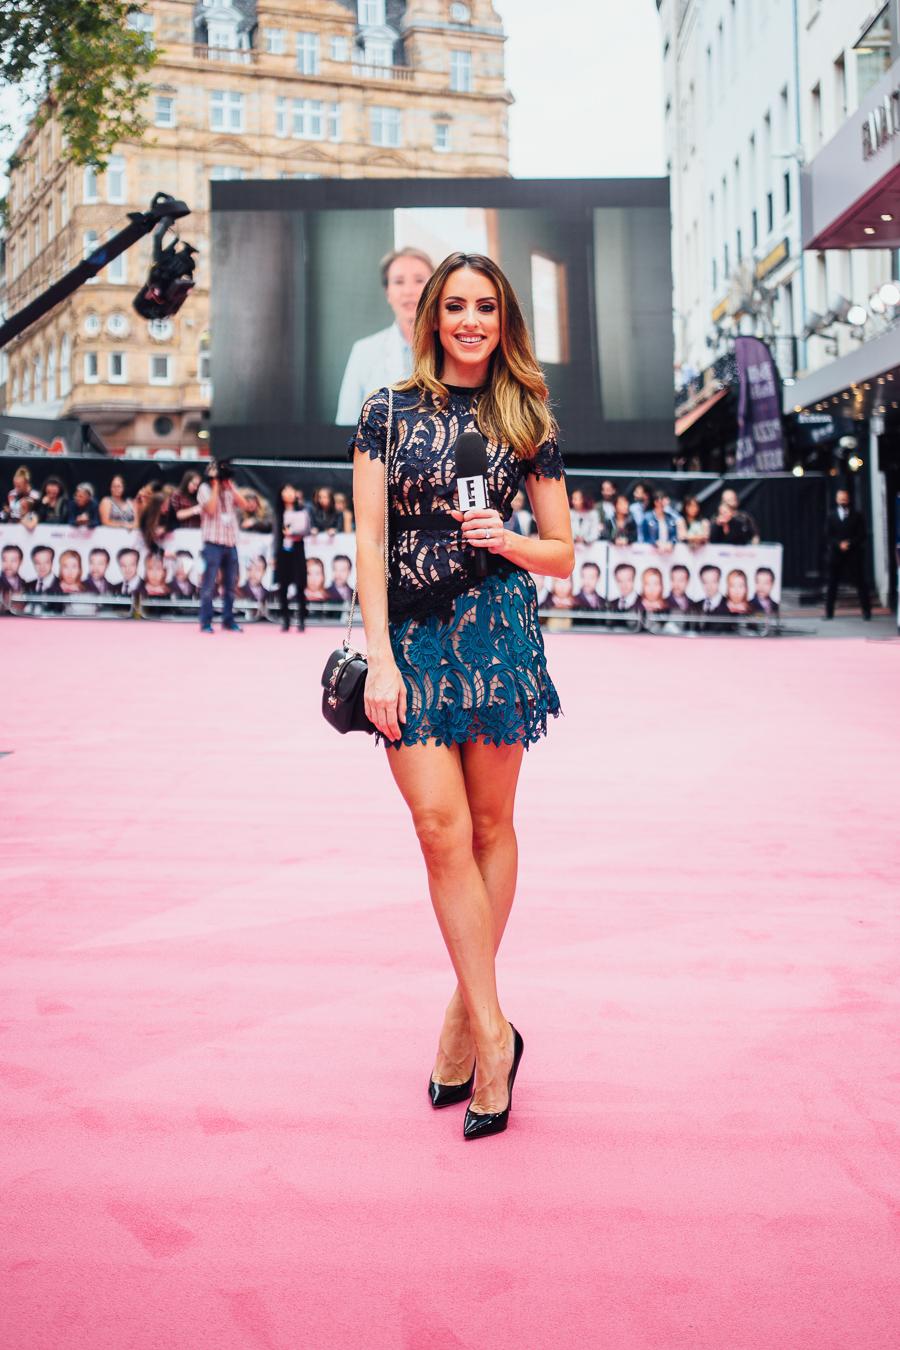 Sabrina Chakici E! UK Ireland  - Bridget Jones Baby world premiere - clutch and carry on blog - E! Host UK & Ireland_-13